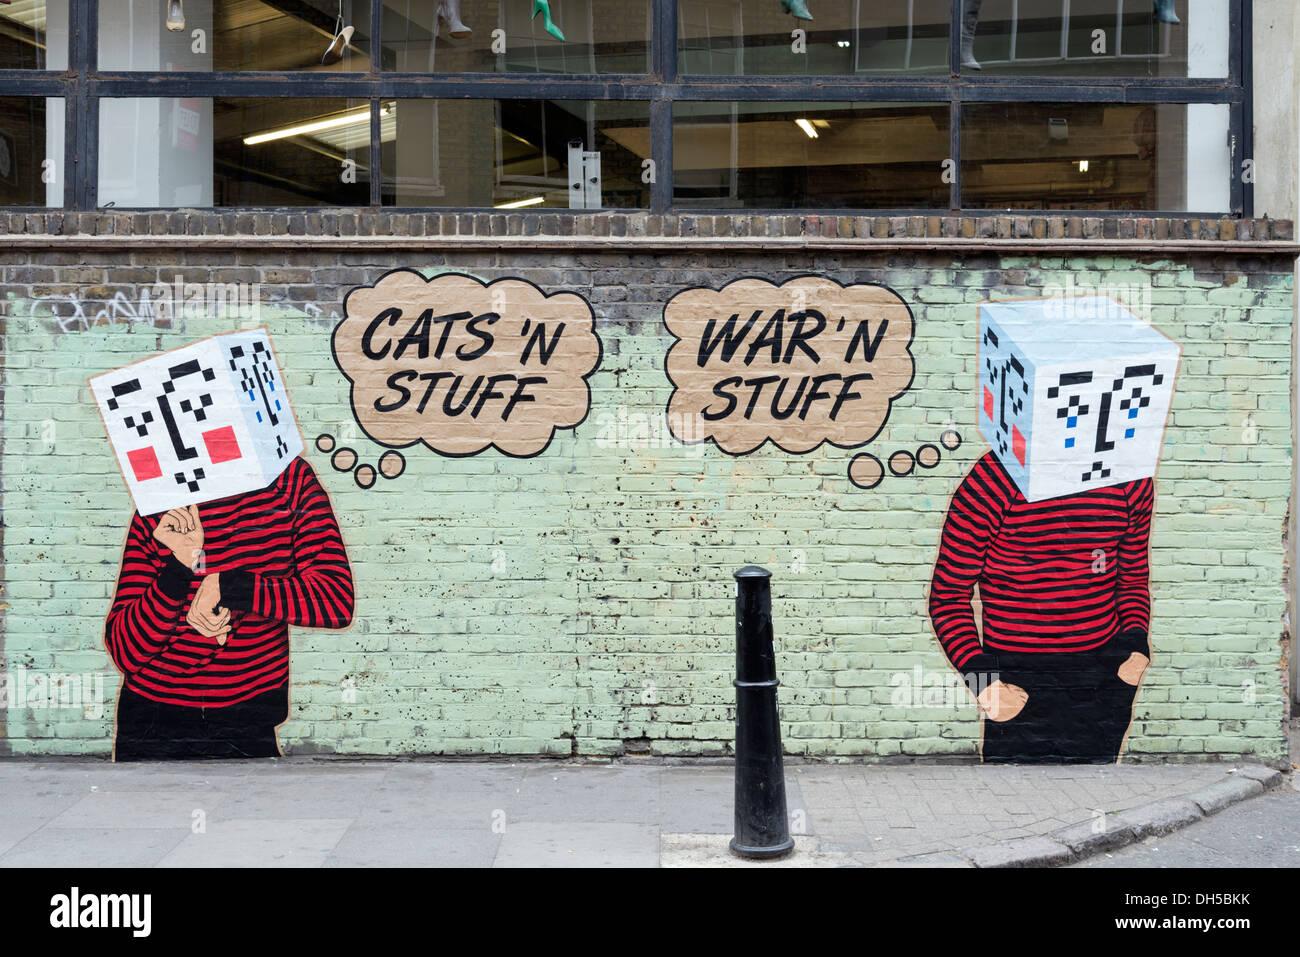 Graffiti street art in Hanbury Street, Spitalfields, East End, London, England, UK - Stock Image